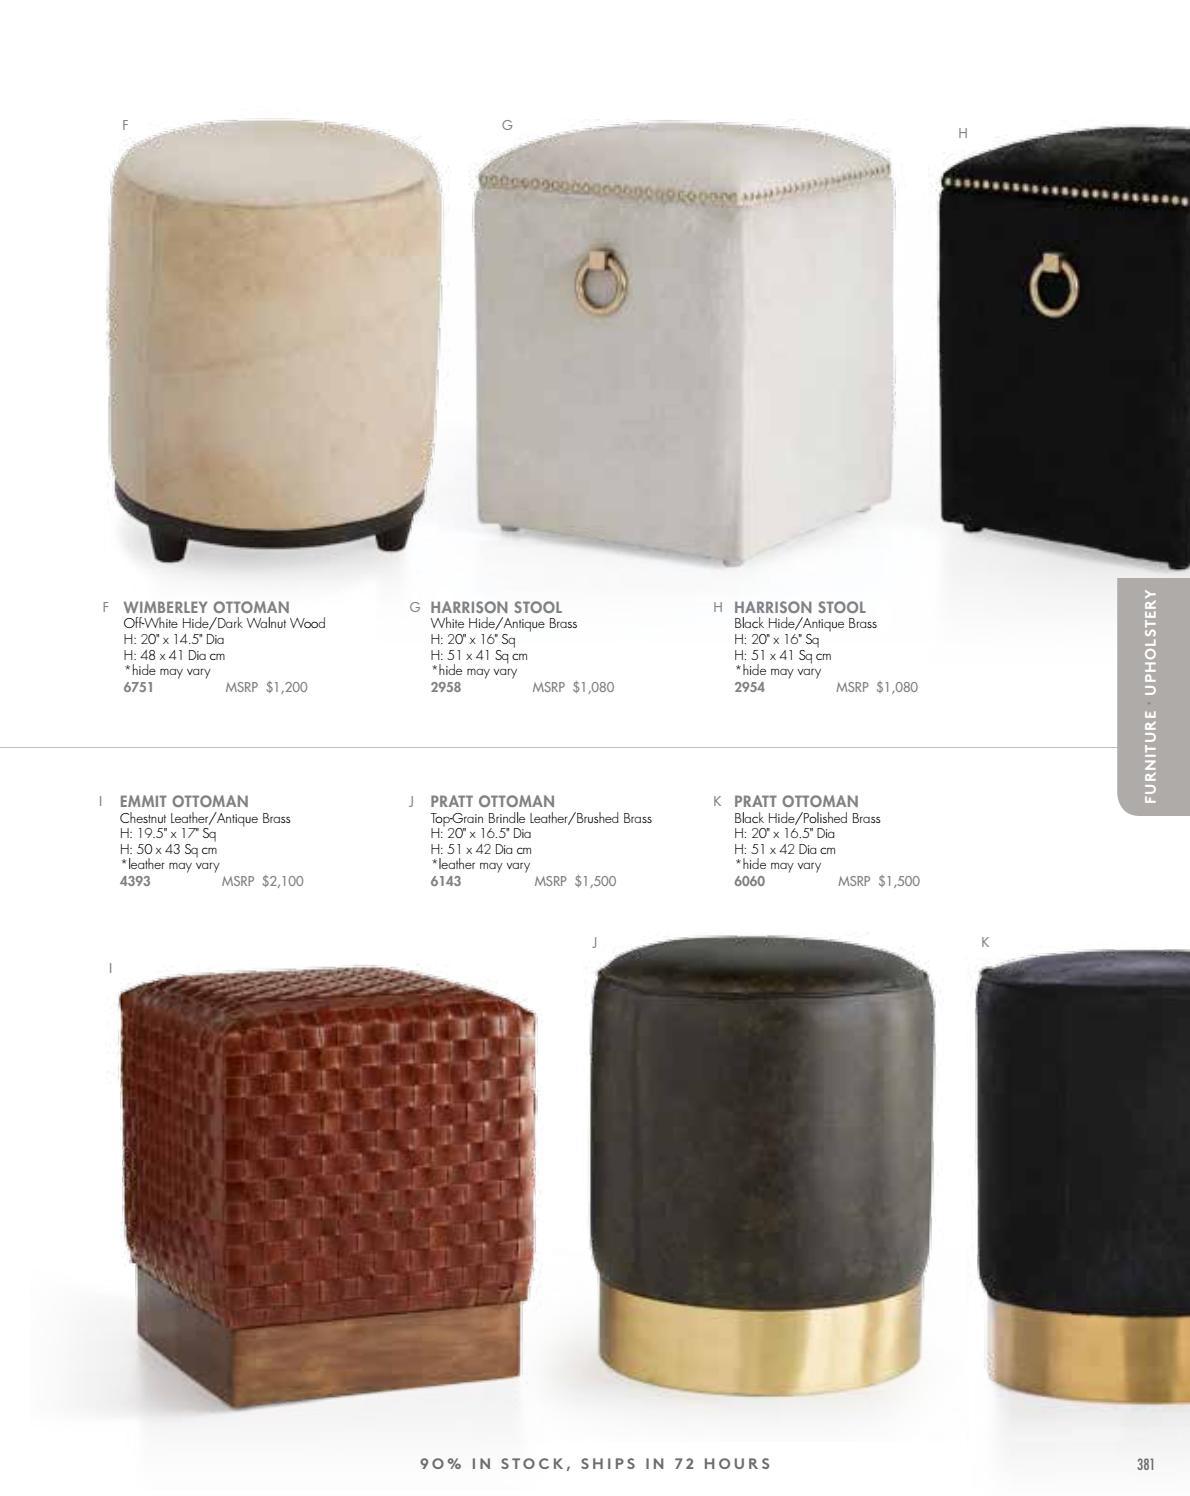 Super Arteriors 2018 Catalog By Arteriors Issuu Beatyapartments Chair Design Images Beatyapartmentscom